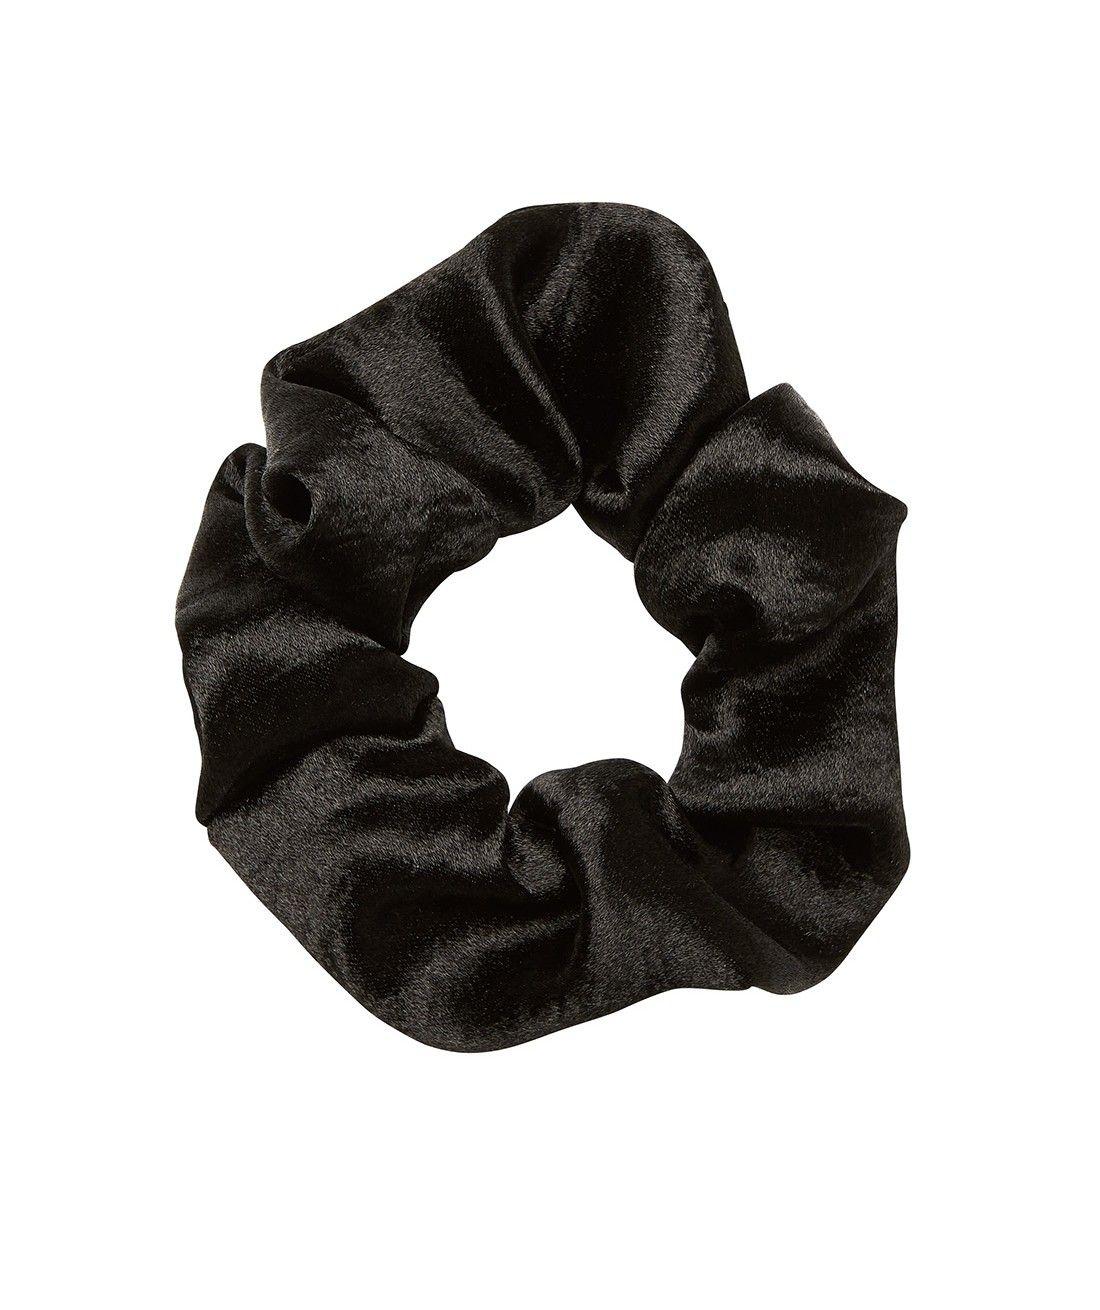 5be7d5ec9db BLACK SATIN SCRUNCHIE | Scrunchies | Black scrunchies, Scrunchies ...